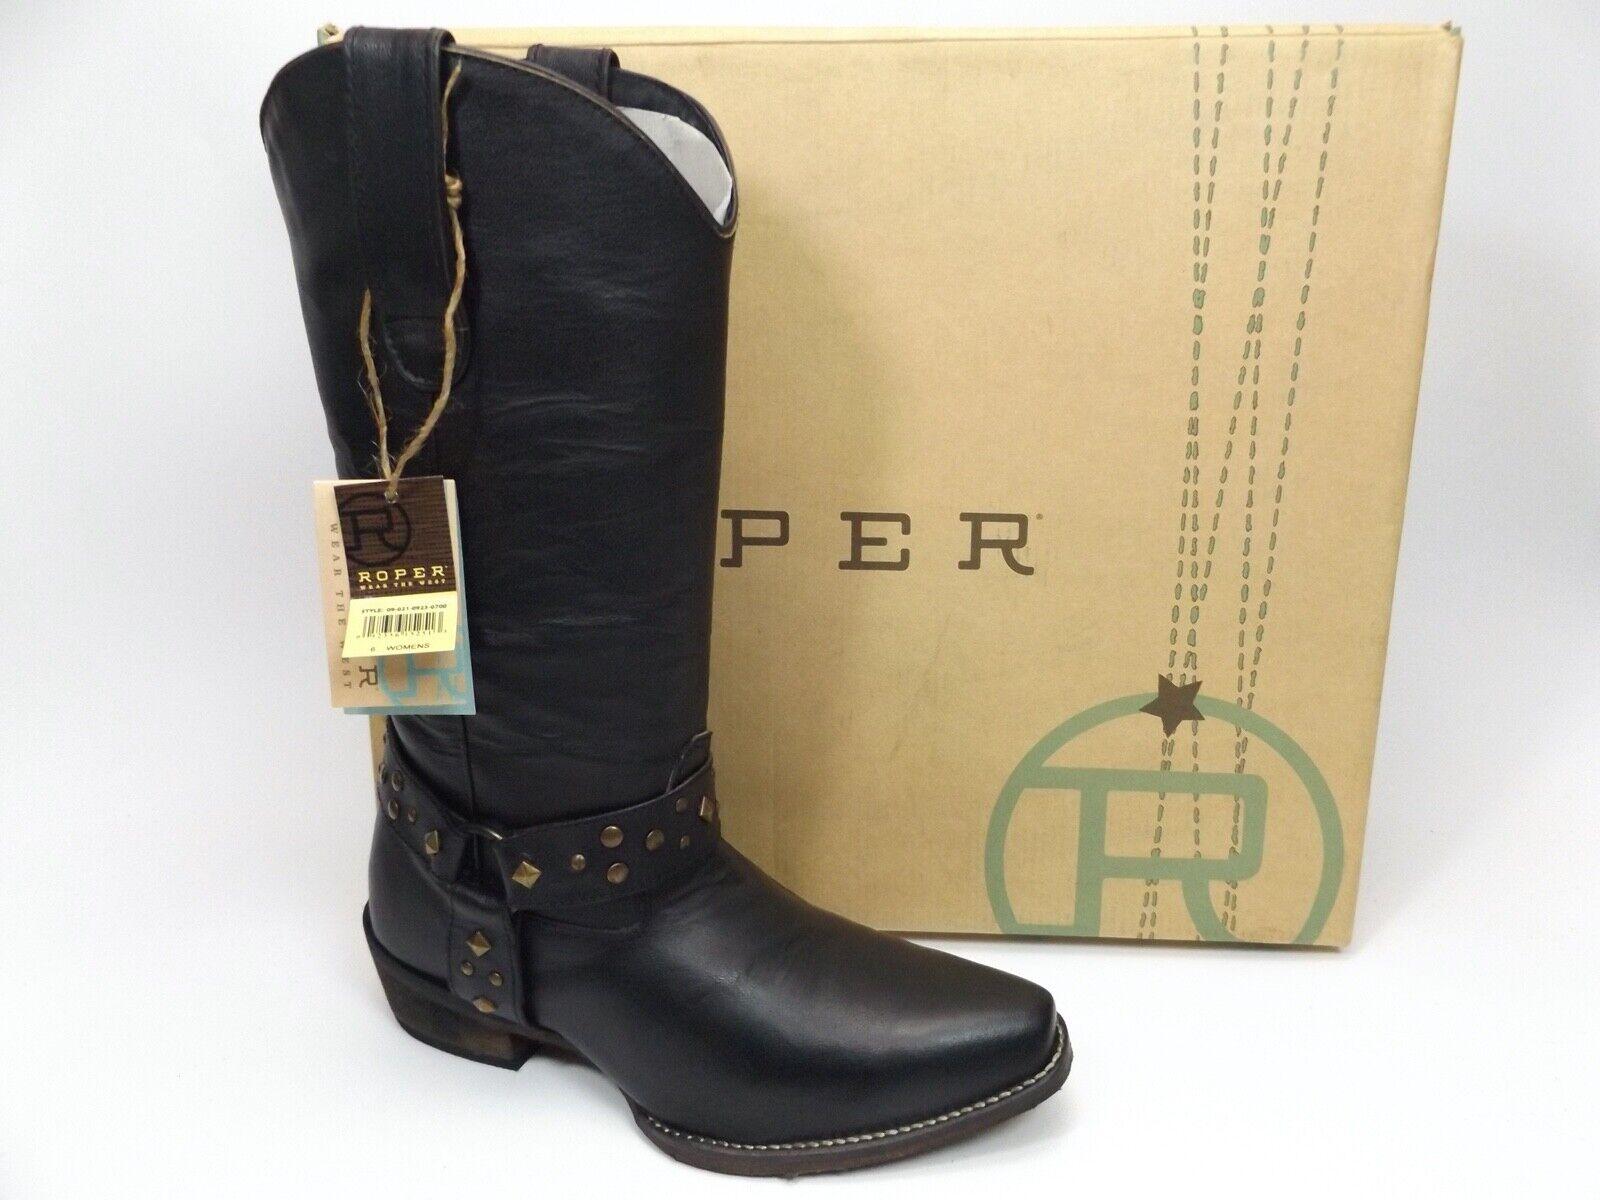 Roper Studded Harness Square Snip Western Cowboy Boots Women's SZ 6.0 M, D13611